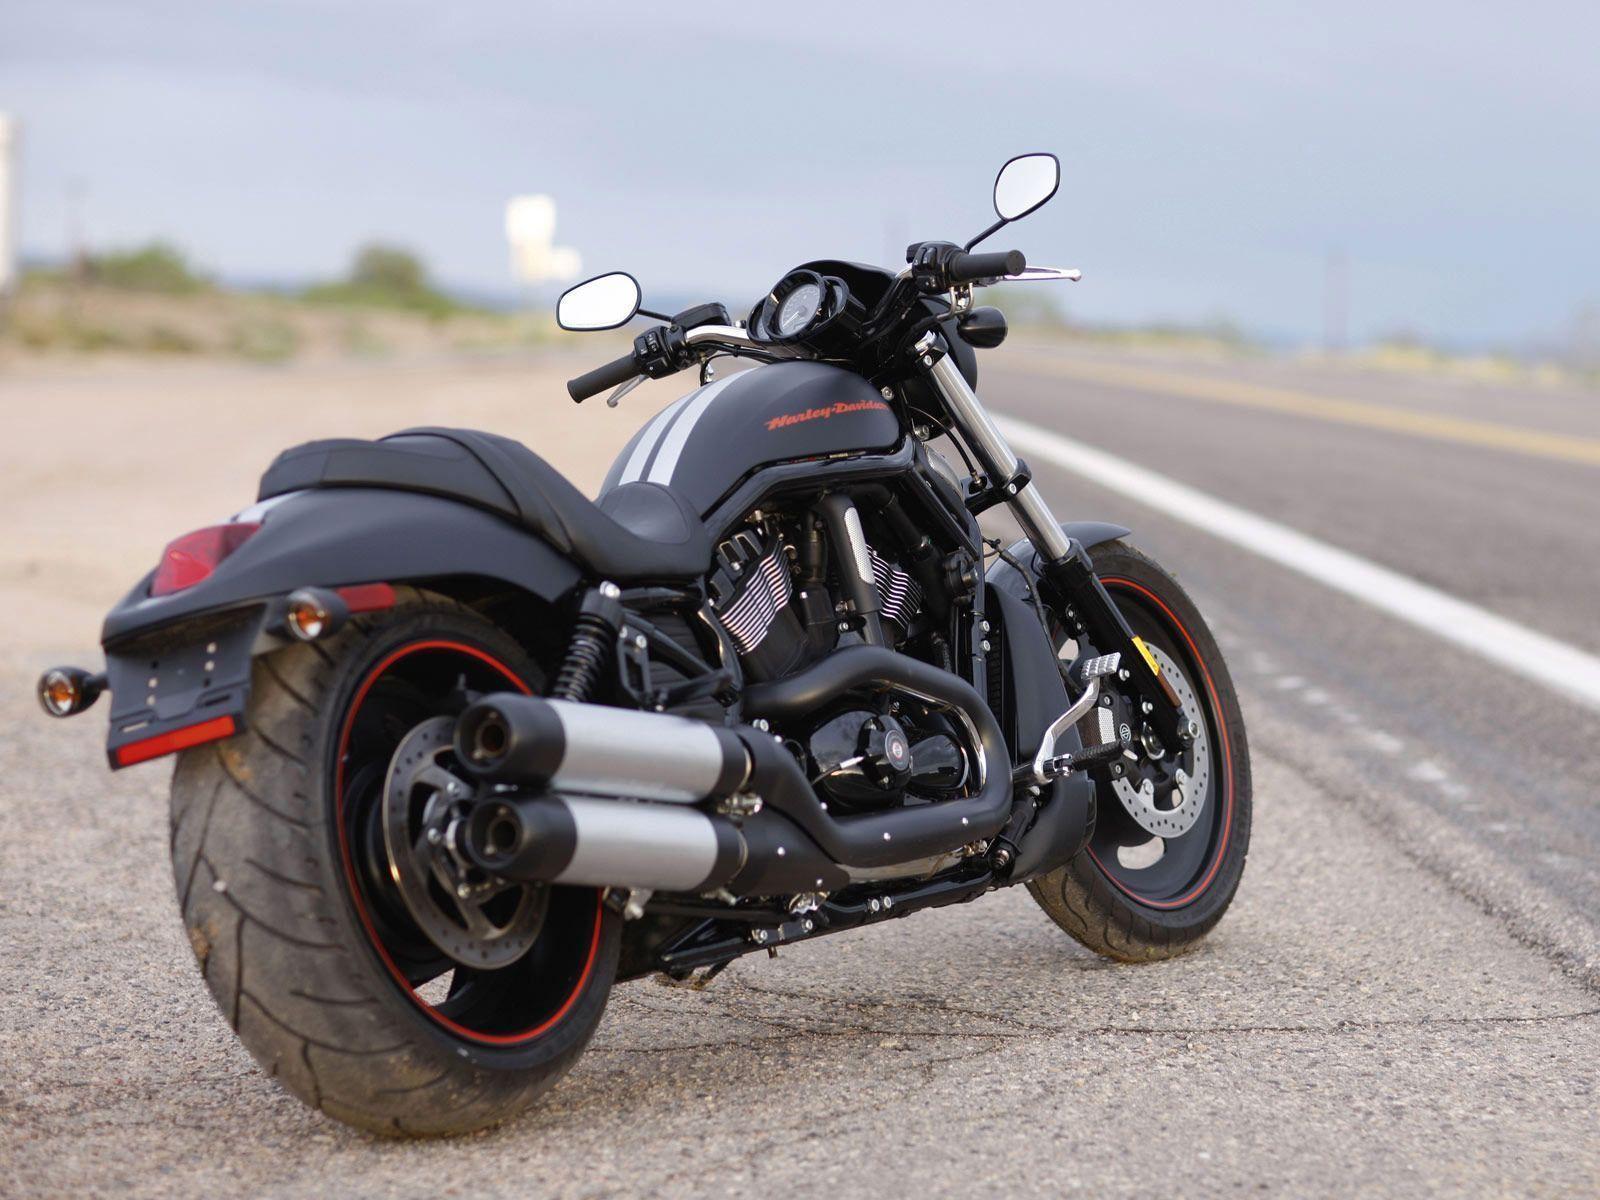 Harley Davidson hardwire strategy